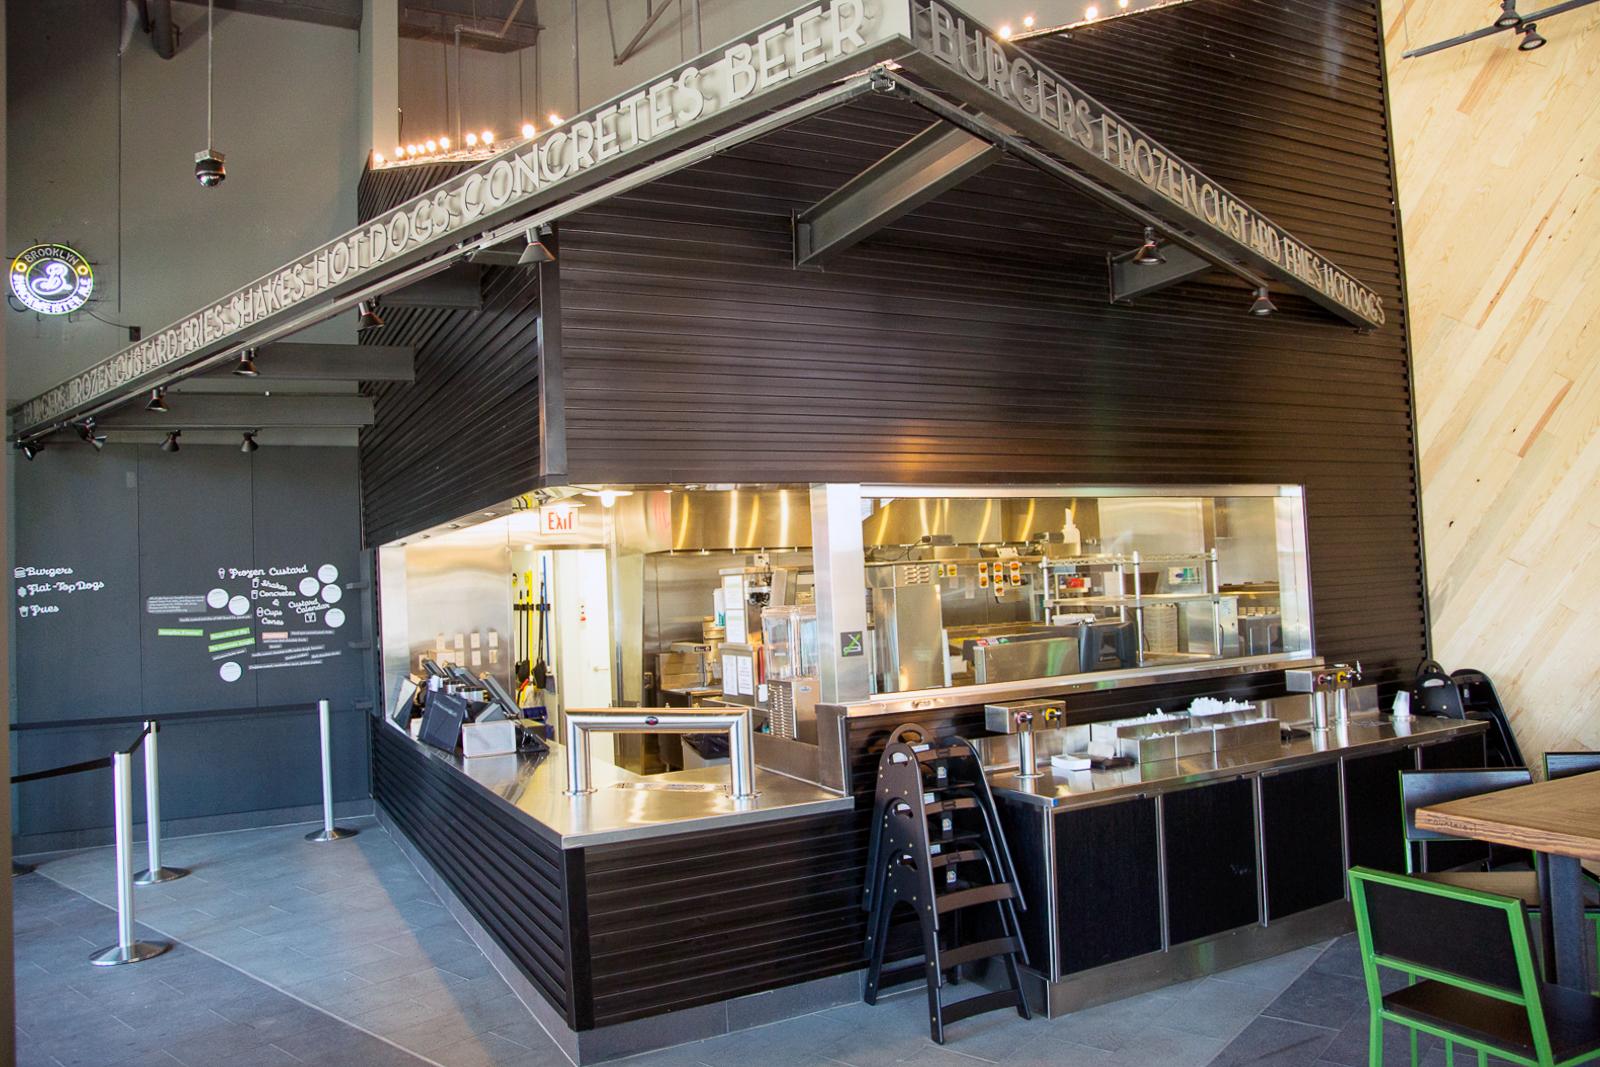 Shake shack is now open in buckhead atlanta eater atlanta - Interior design colleges in atlanta ga ...